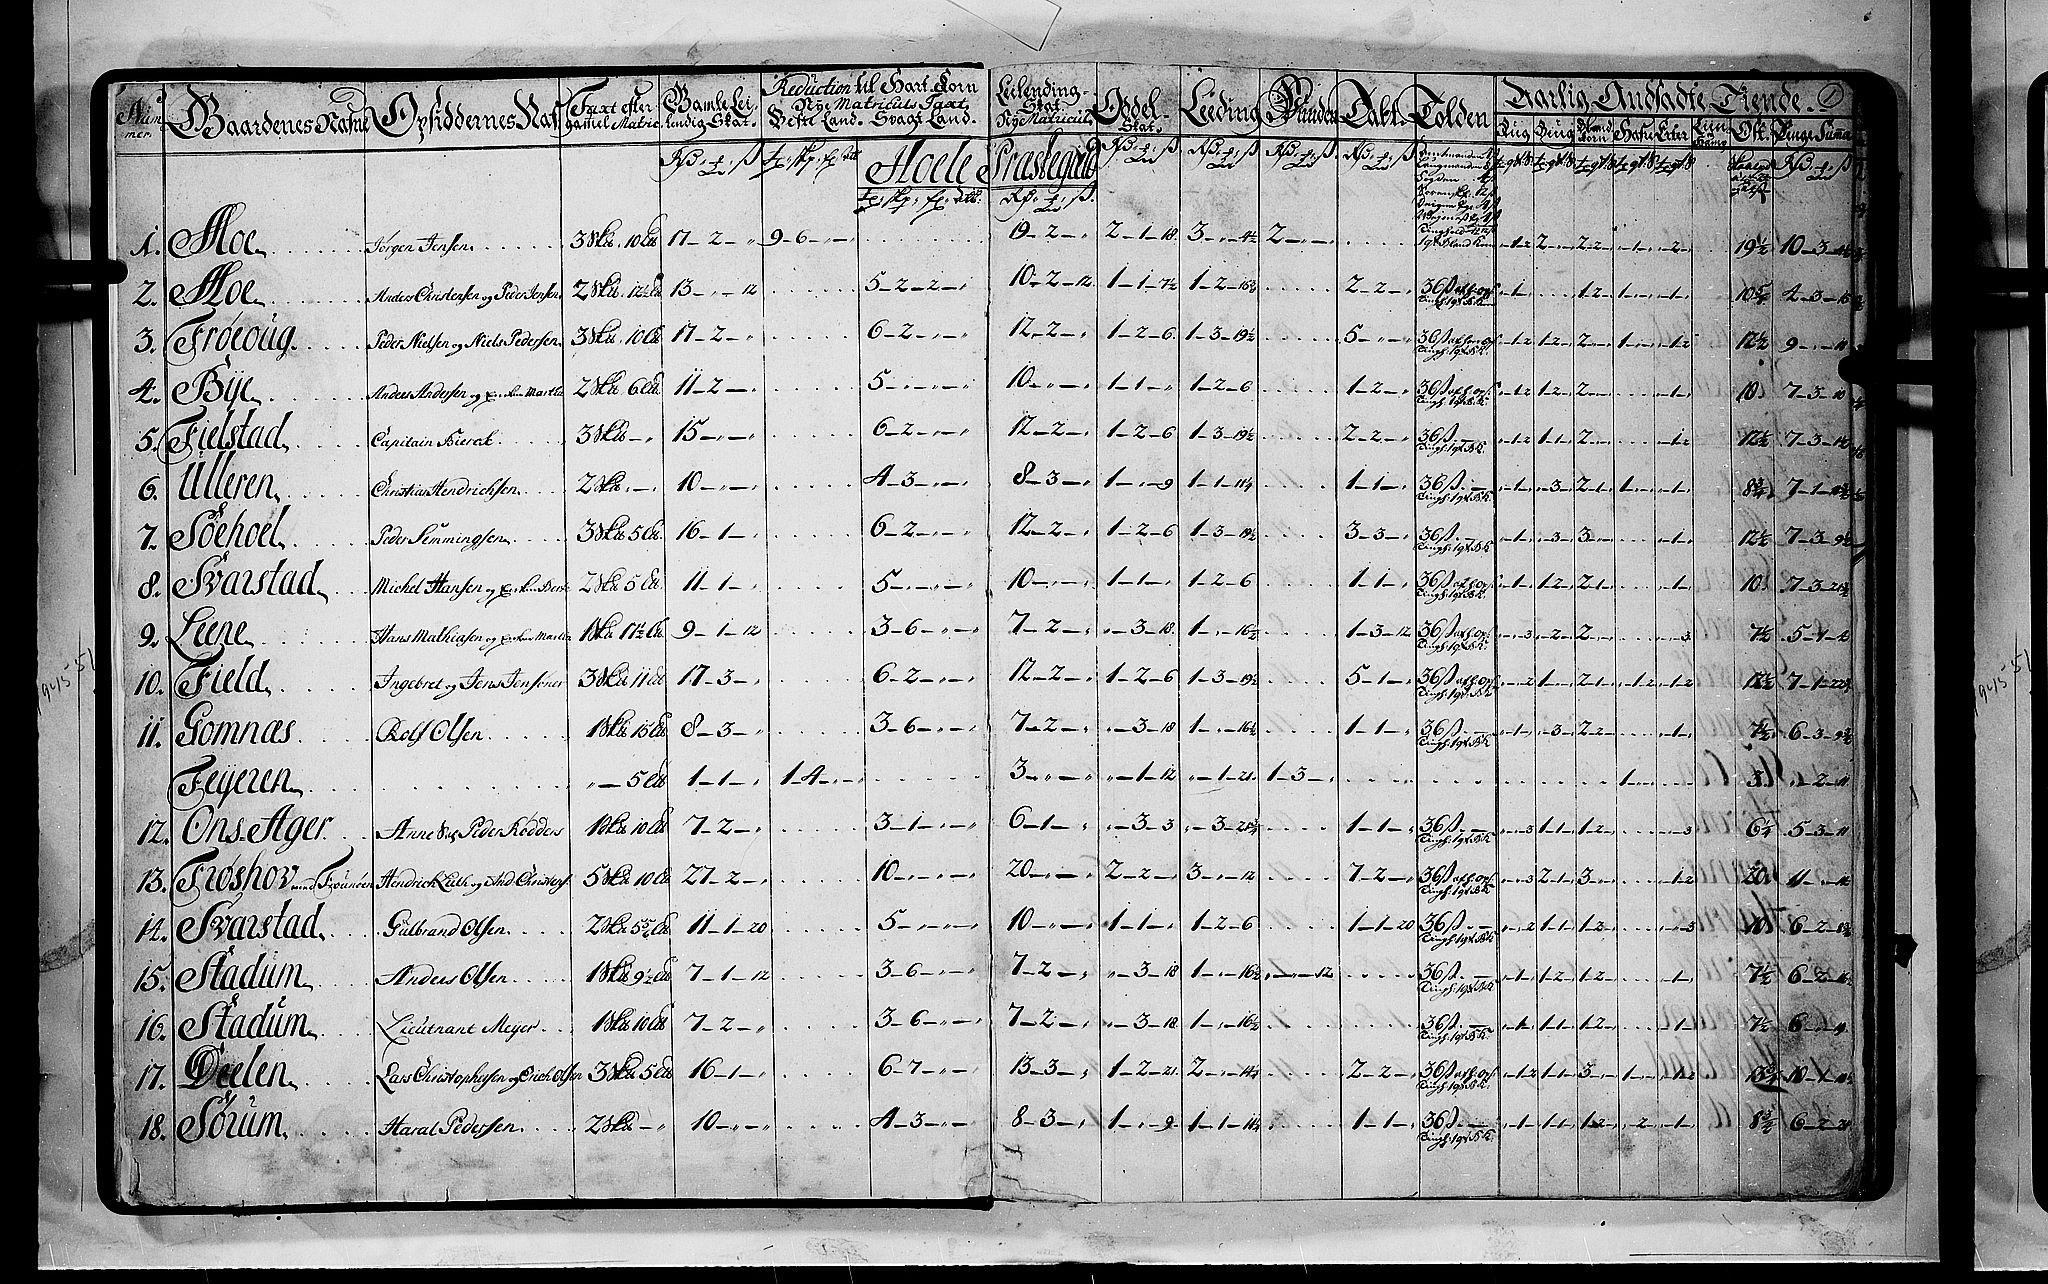 RA, Rentekammeret inntil 1814, Realistisk ordnet avdeling, N/Nb/Nbf/L0110: Ringerike og Hallingdal matrikkelprotokoll, 1723, s. 1a